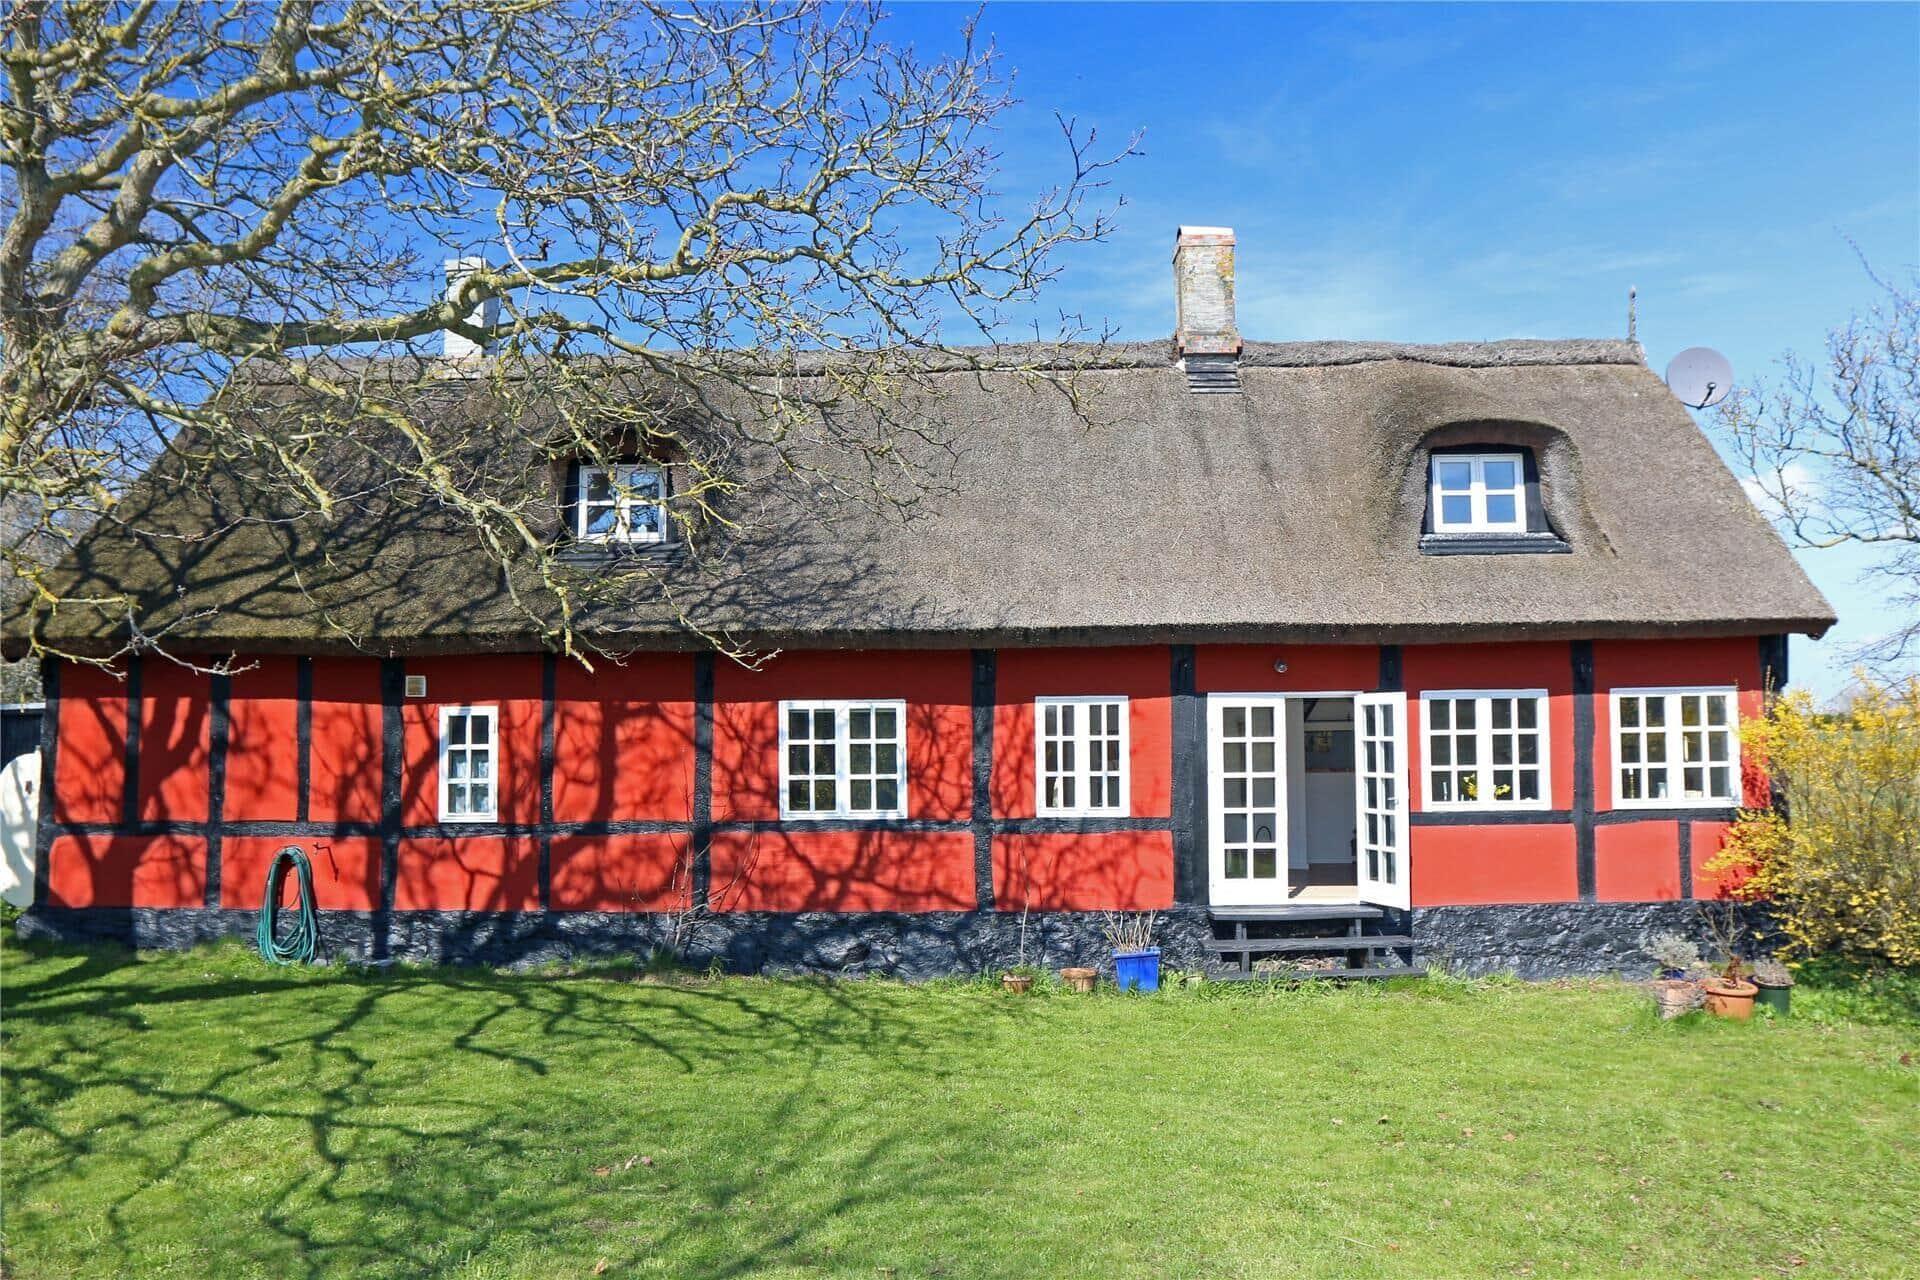 Bild 1-10 Ferienhaus 4747, Bodernevej 10, DK - 3720 Aakirkeby